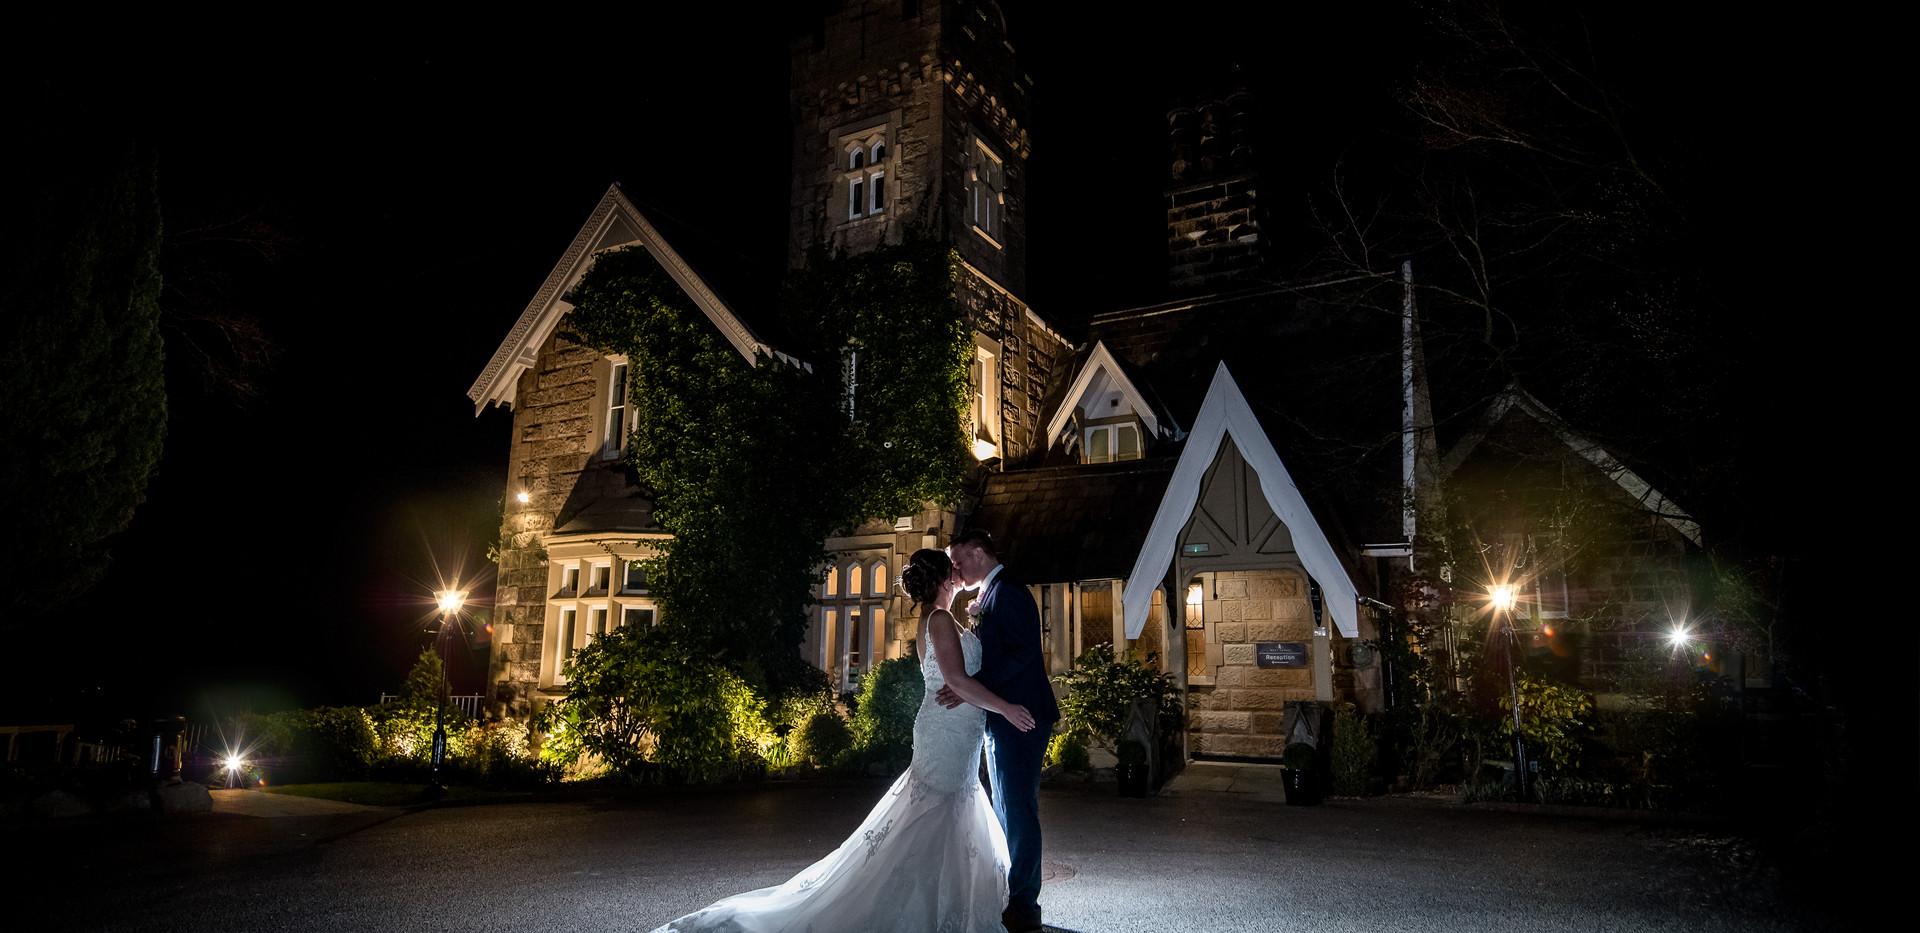 West Tower Wedding Photographer___69.jpg